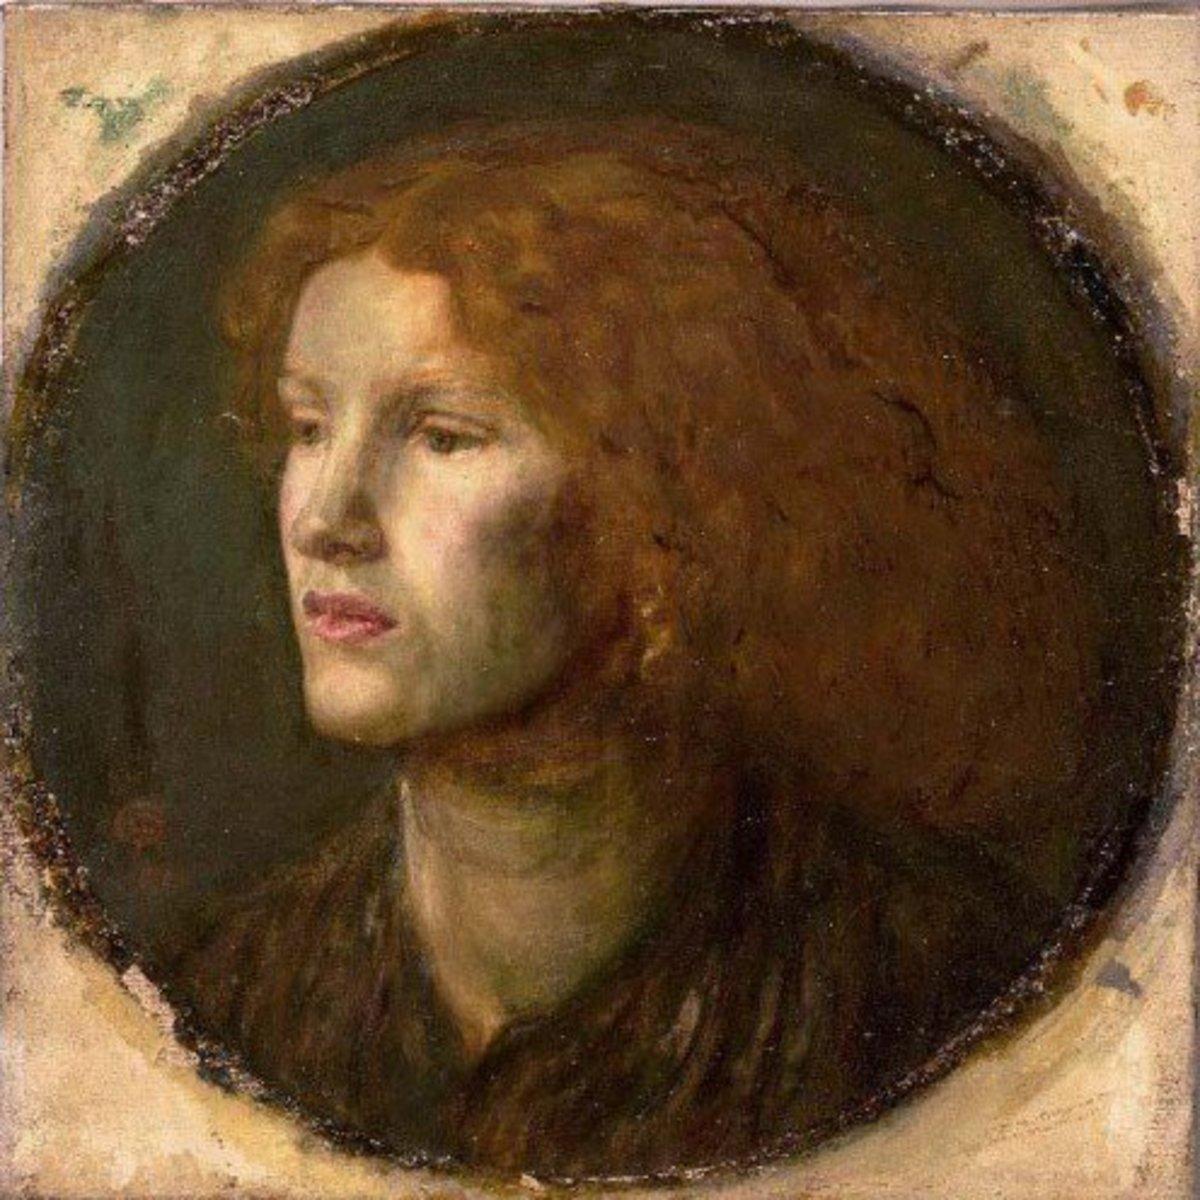 The Life of Pre-Raphaelite Art Model Fanny Cornforth